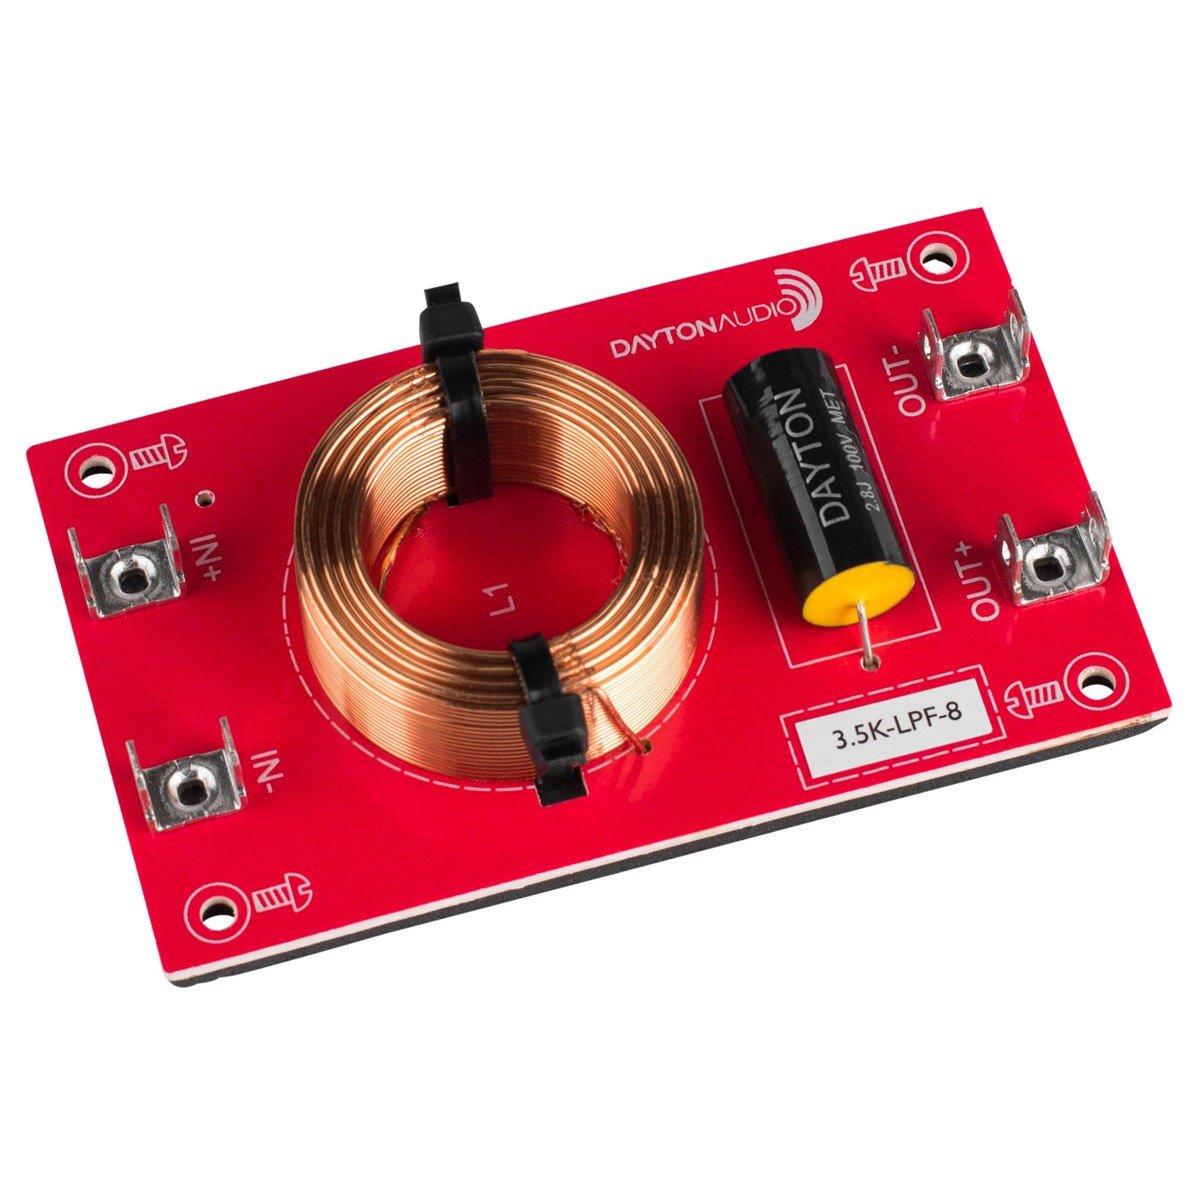 DAYTON AUDIO 3.5K-LPF-8 Speaker Low Pass Filter 3500Hz 12dB/Octave 8 Ohm